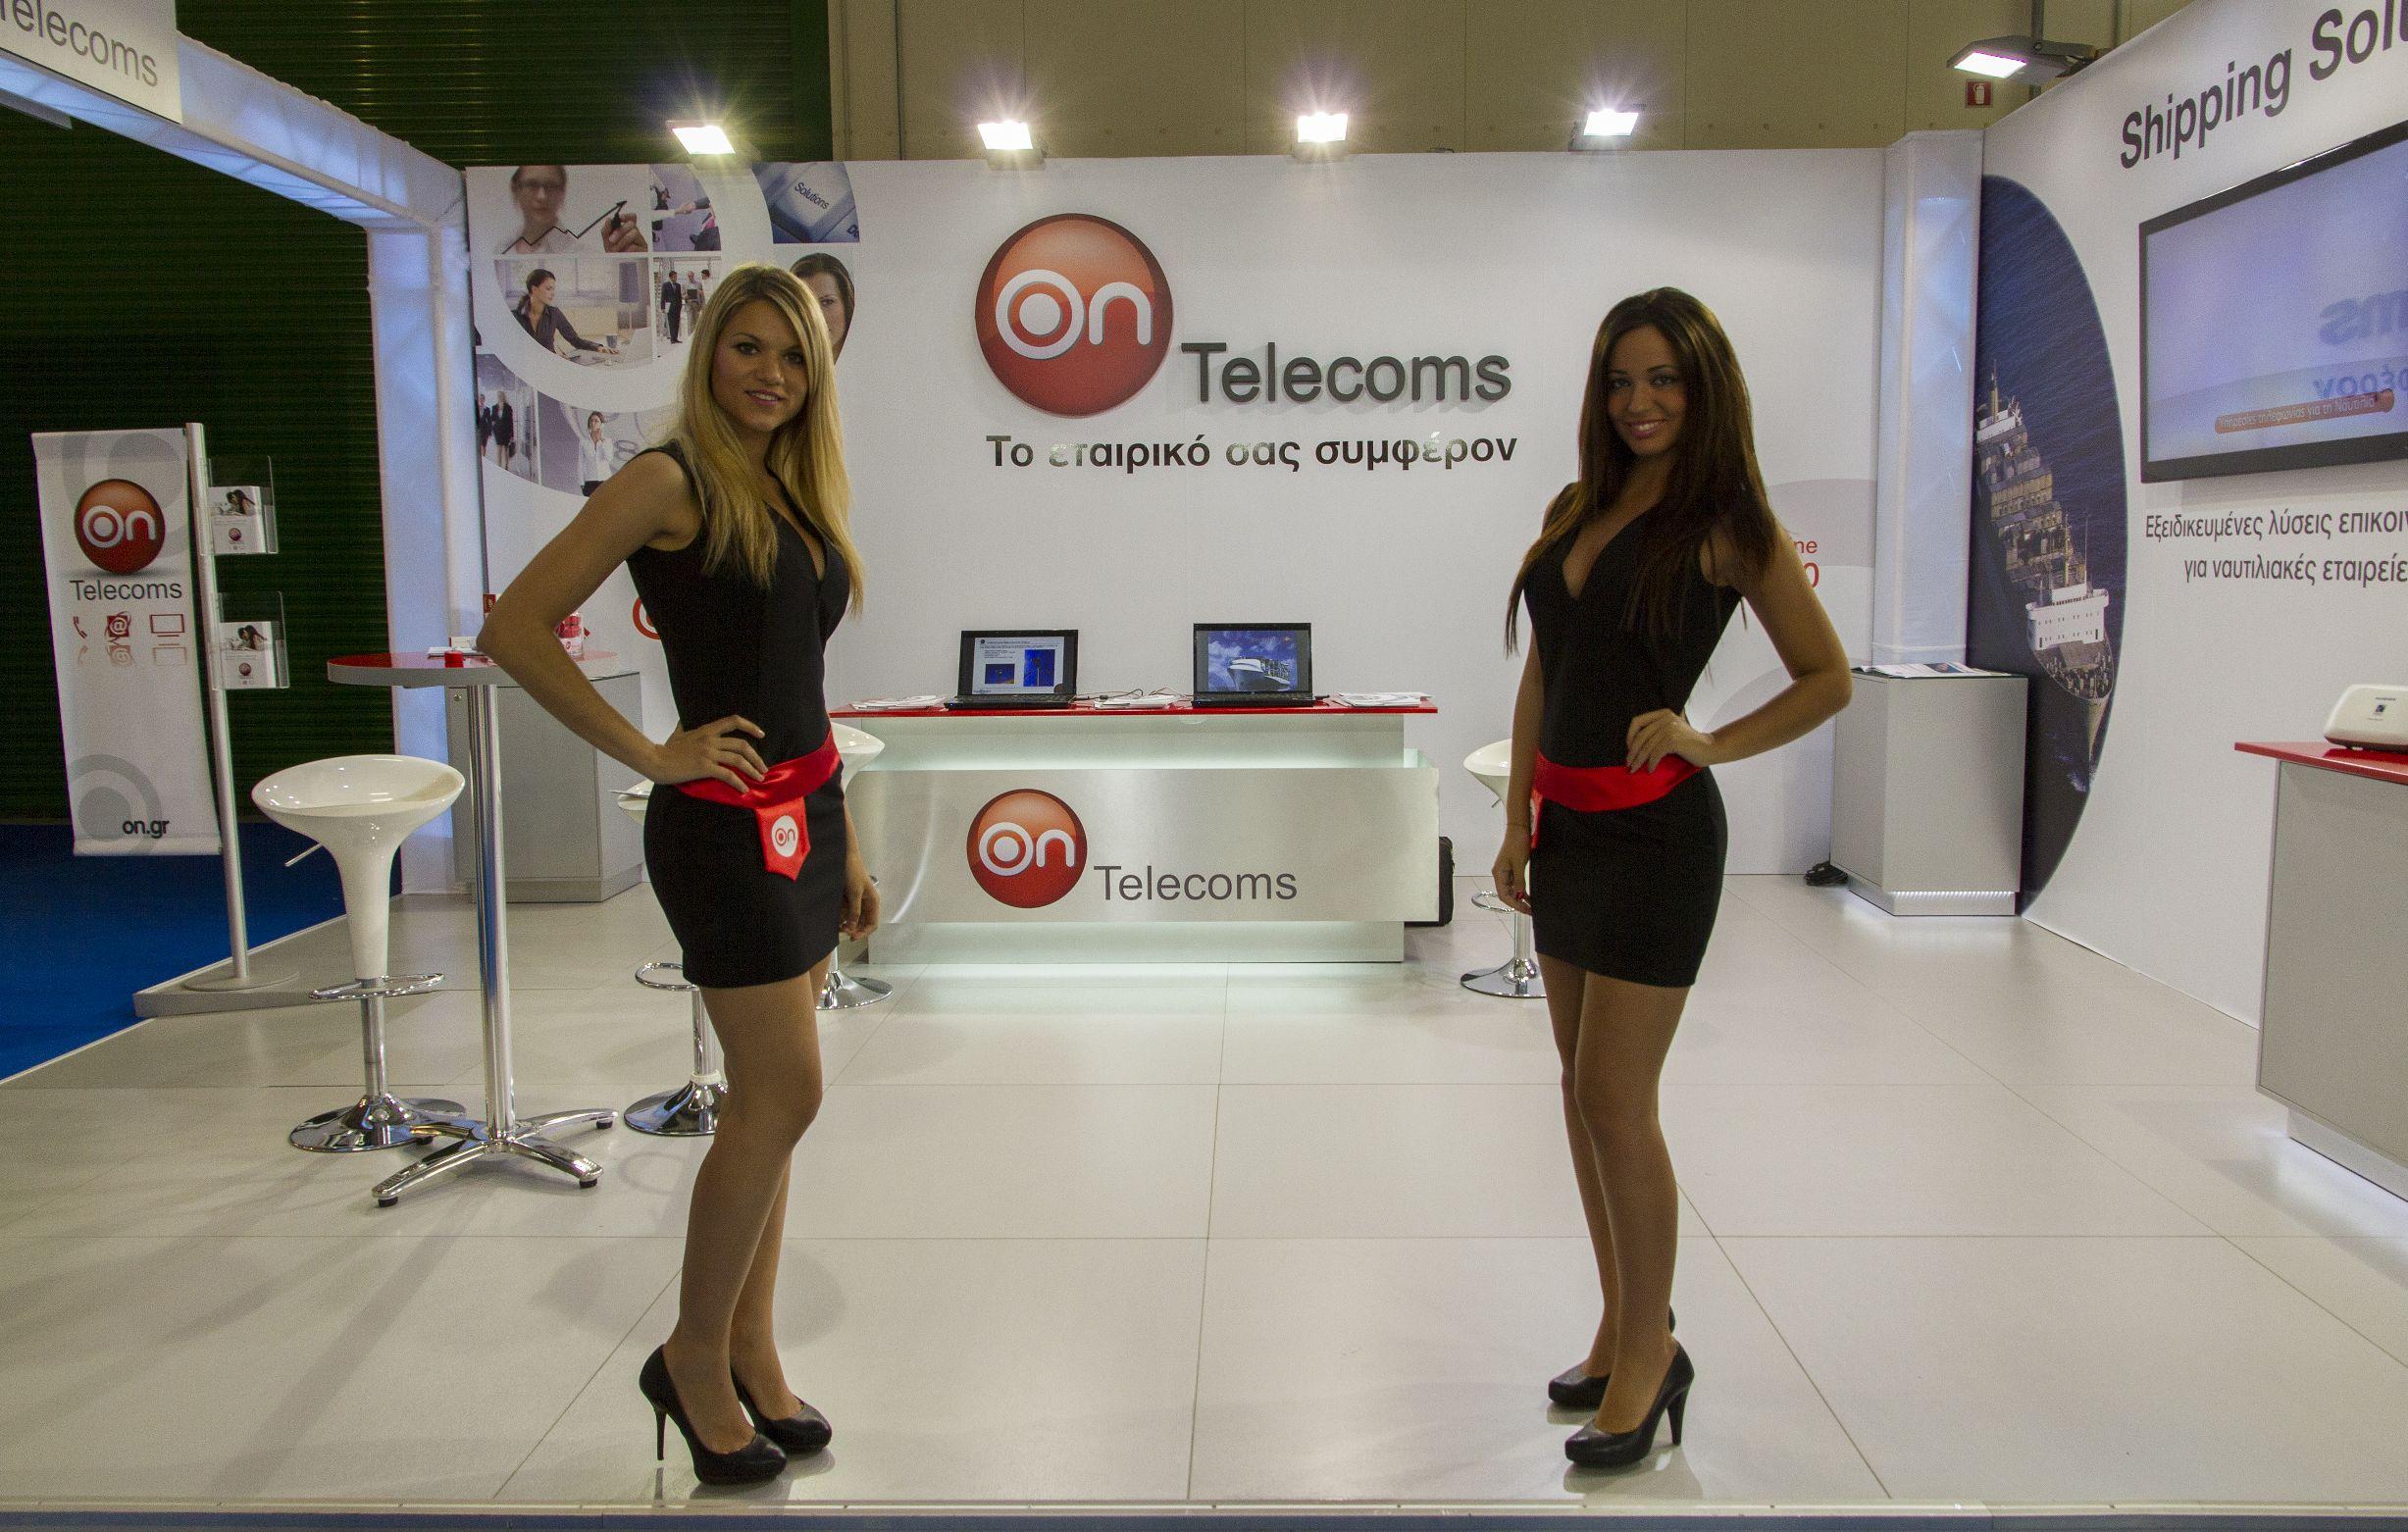 H On Telecoms ένα βήμα πριν το off;